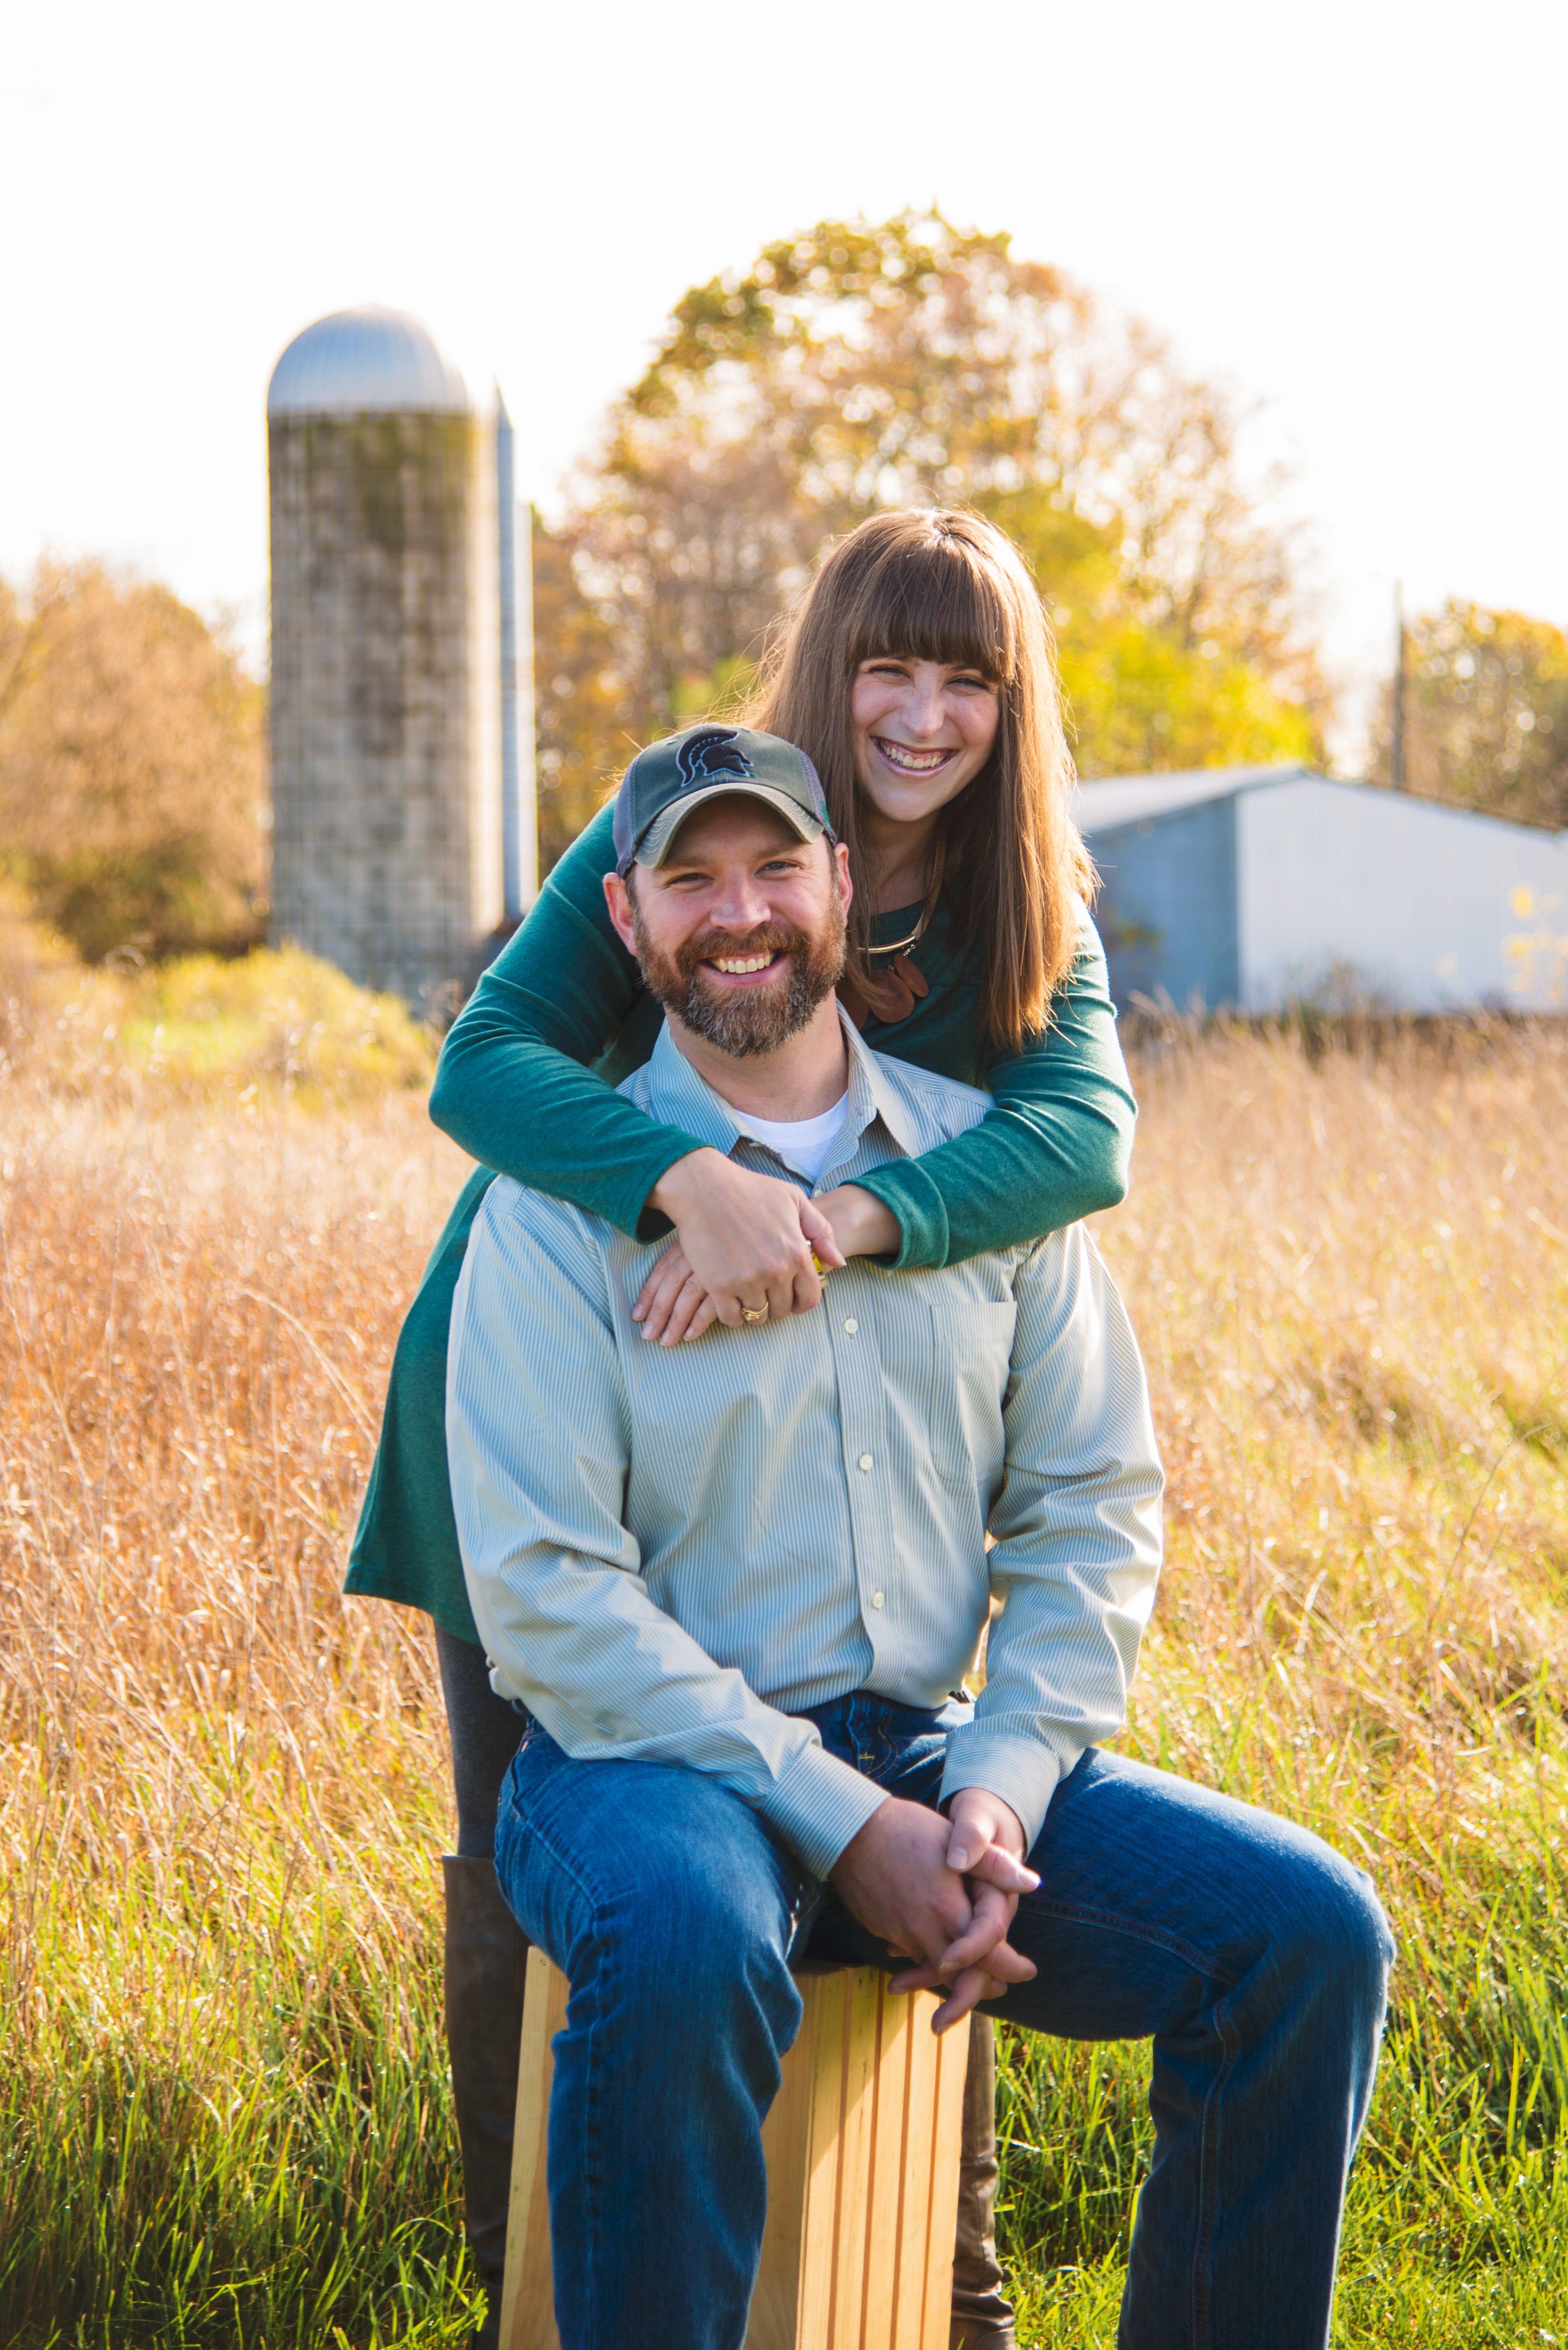 Michigan pharmacist refuses medicine to woman having miscarriage | Burlington Free Press